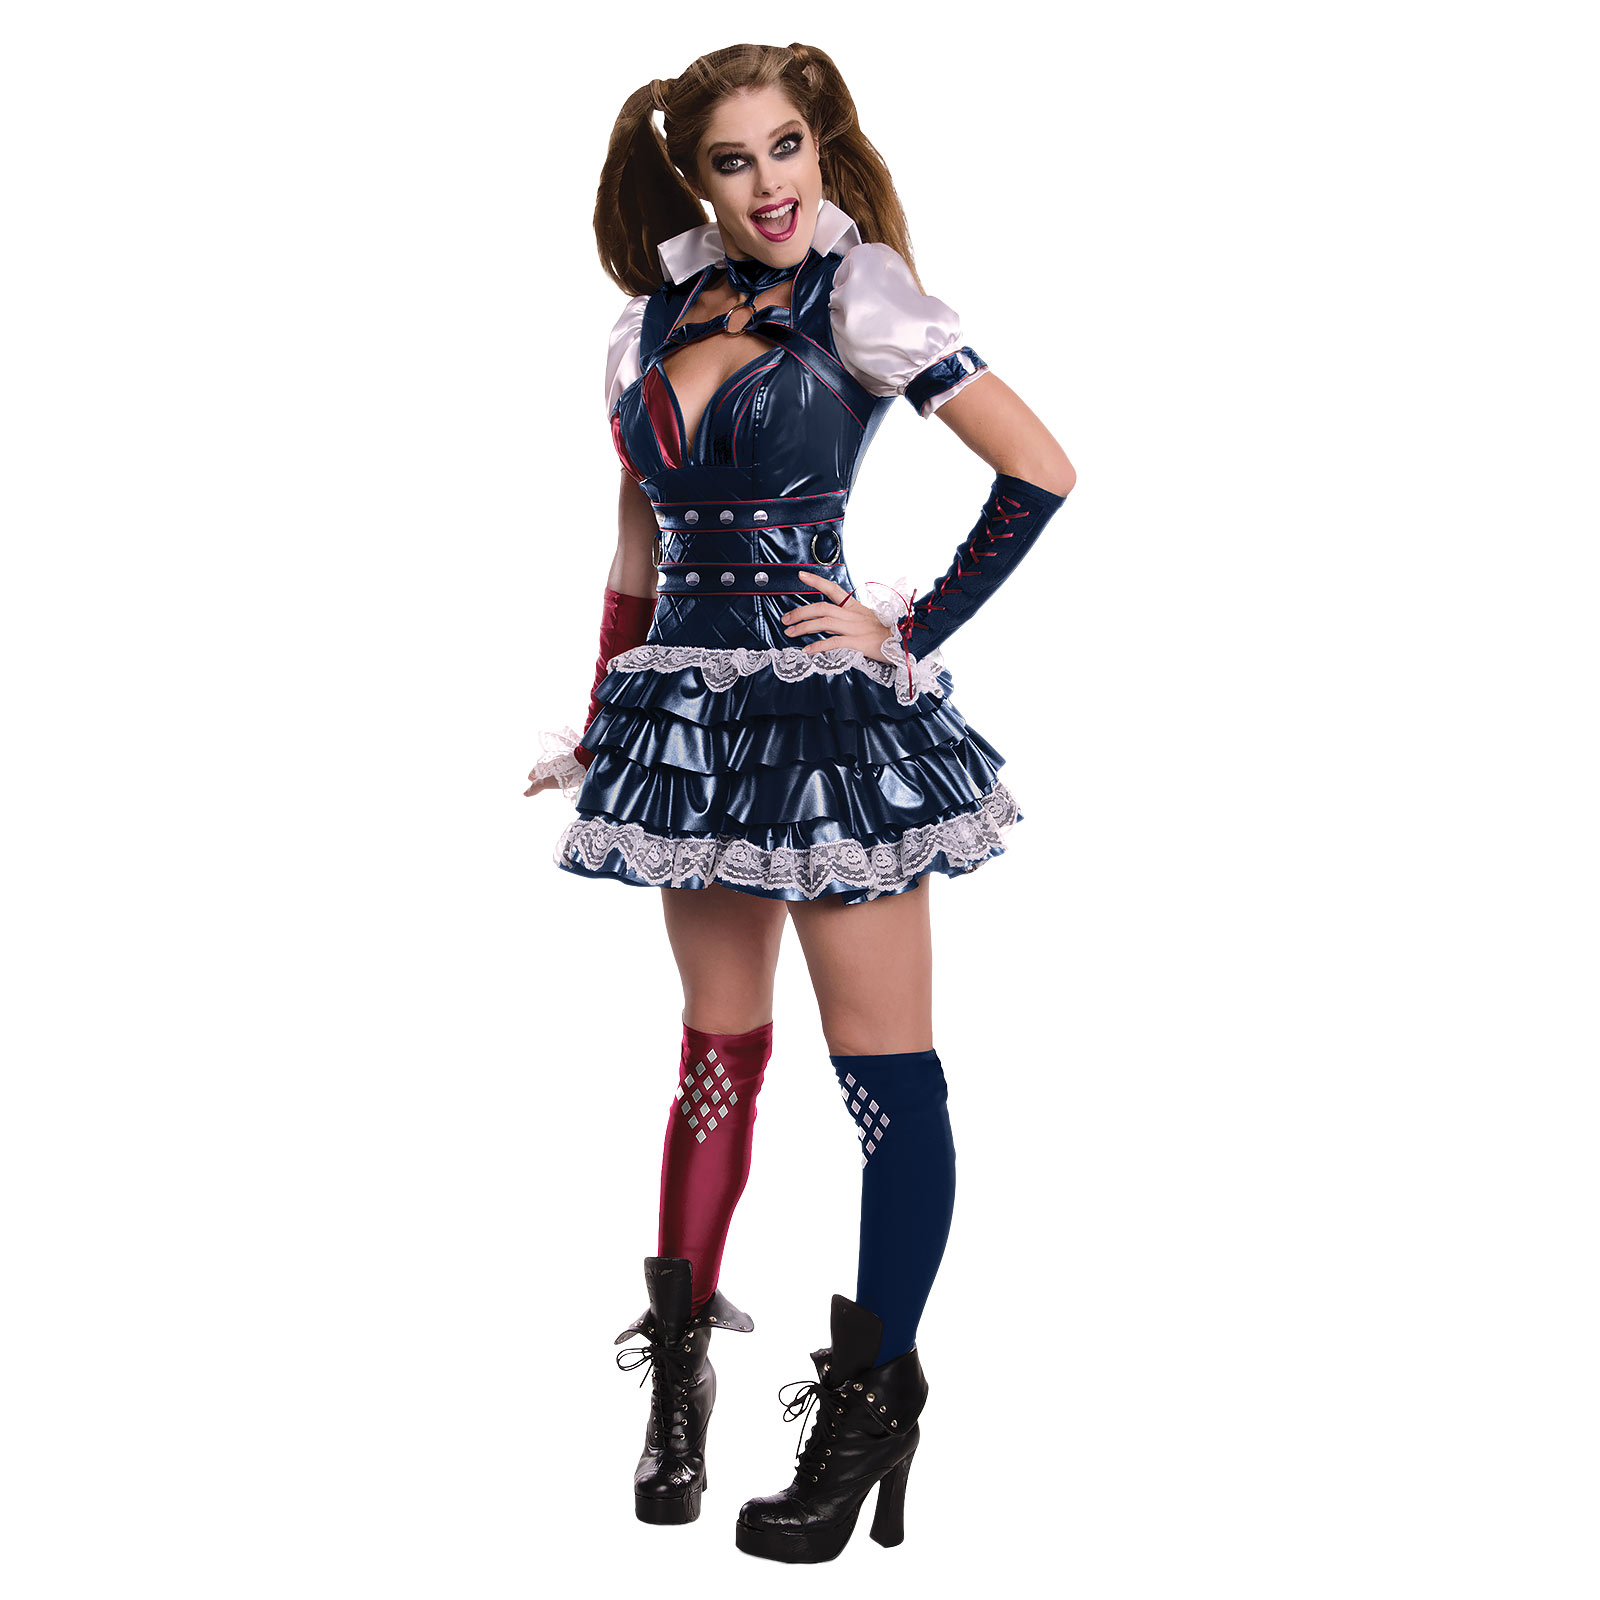 Harley Quinn - Batman Arkham Kostüm